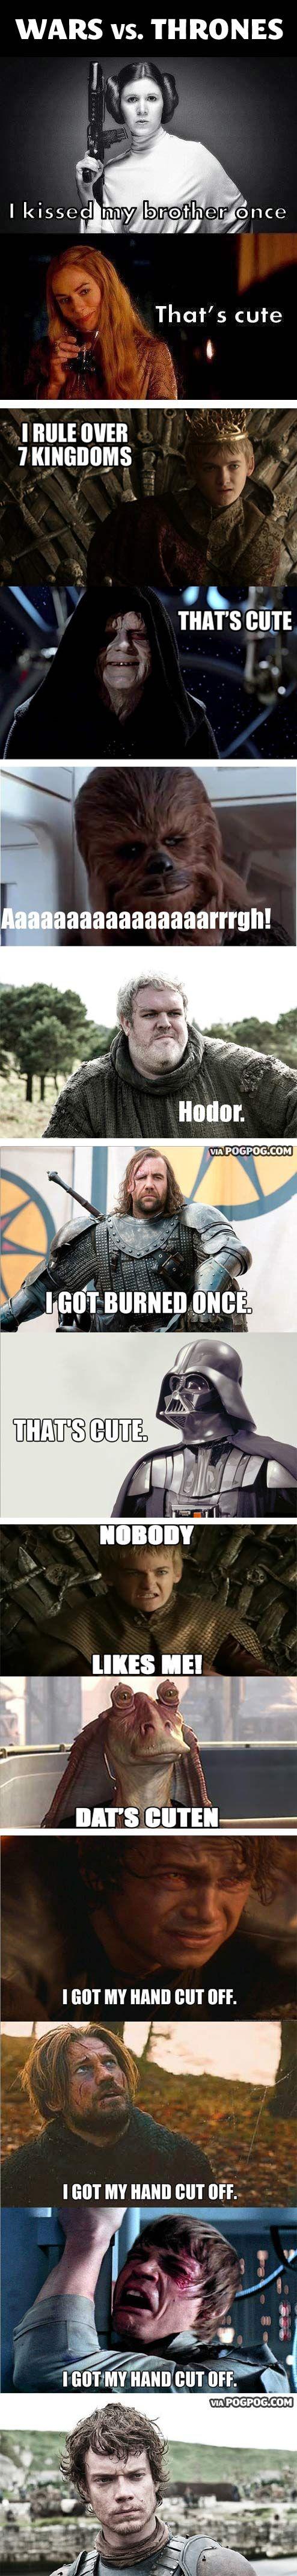 Star Wars vs. Game of Thrones…